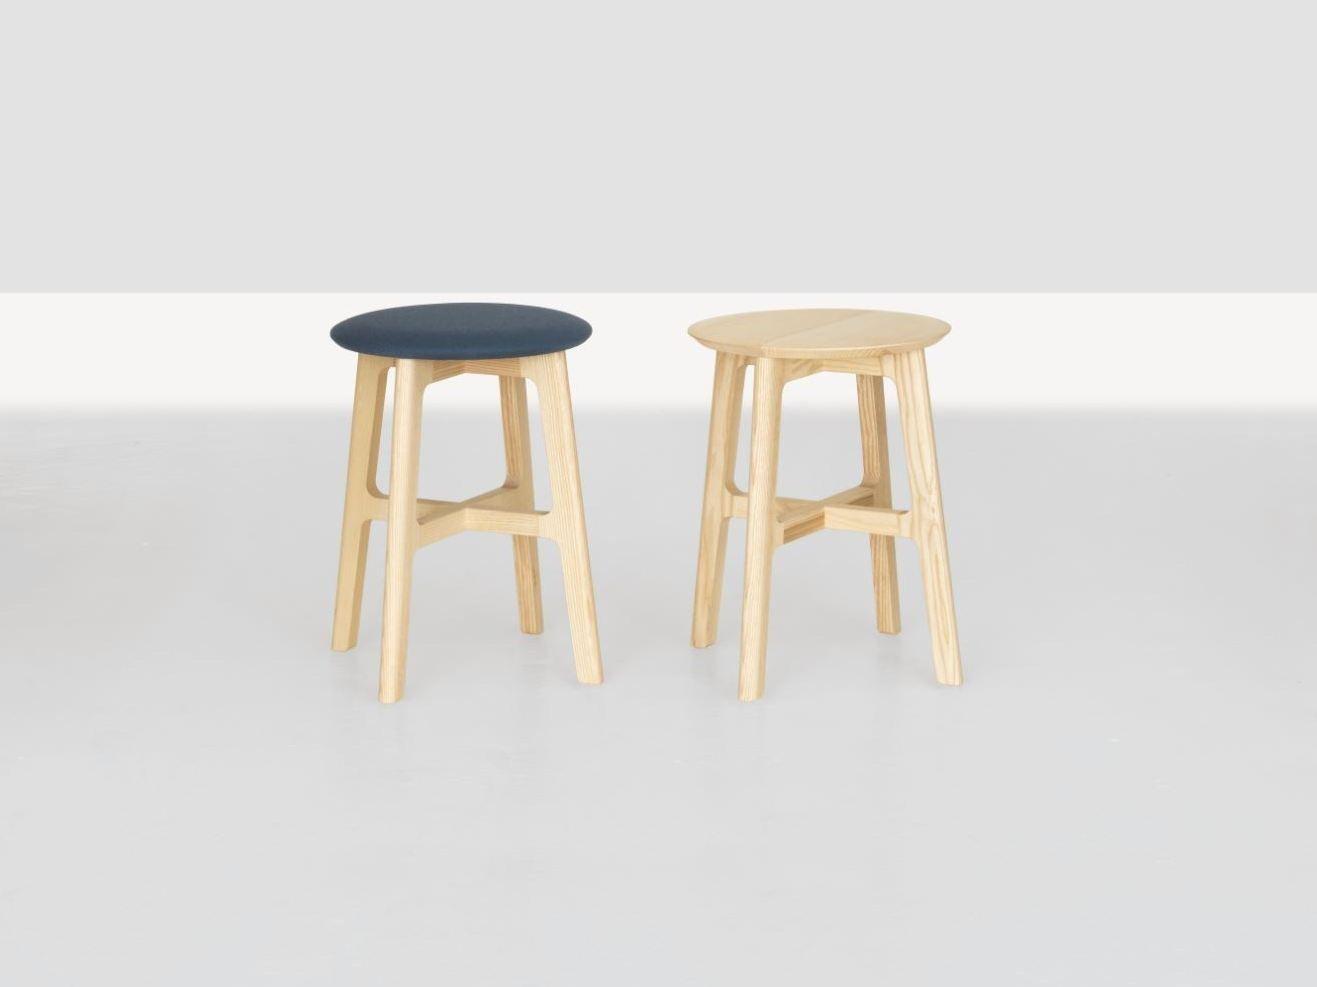 Tabouret Bas En Bois 1 3 Stool By Zeitraum Design Kihyun Kim